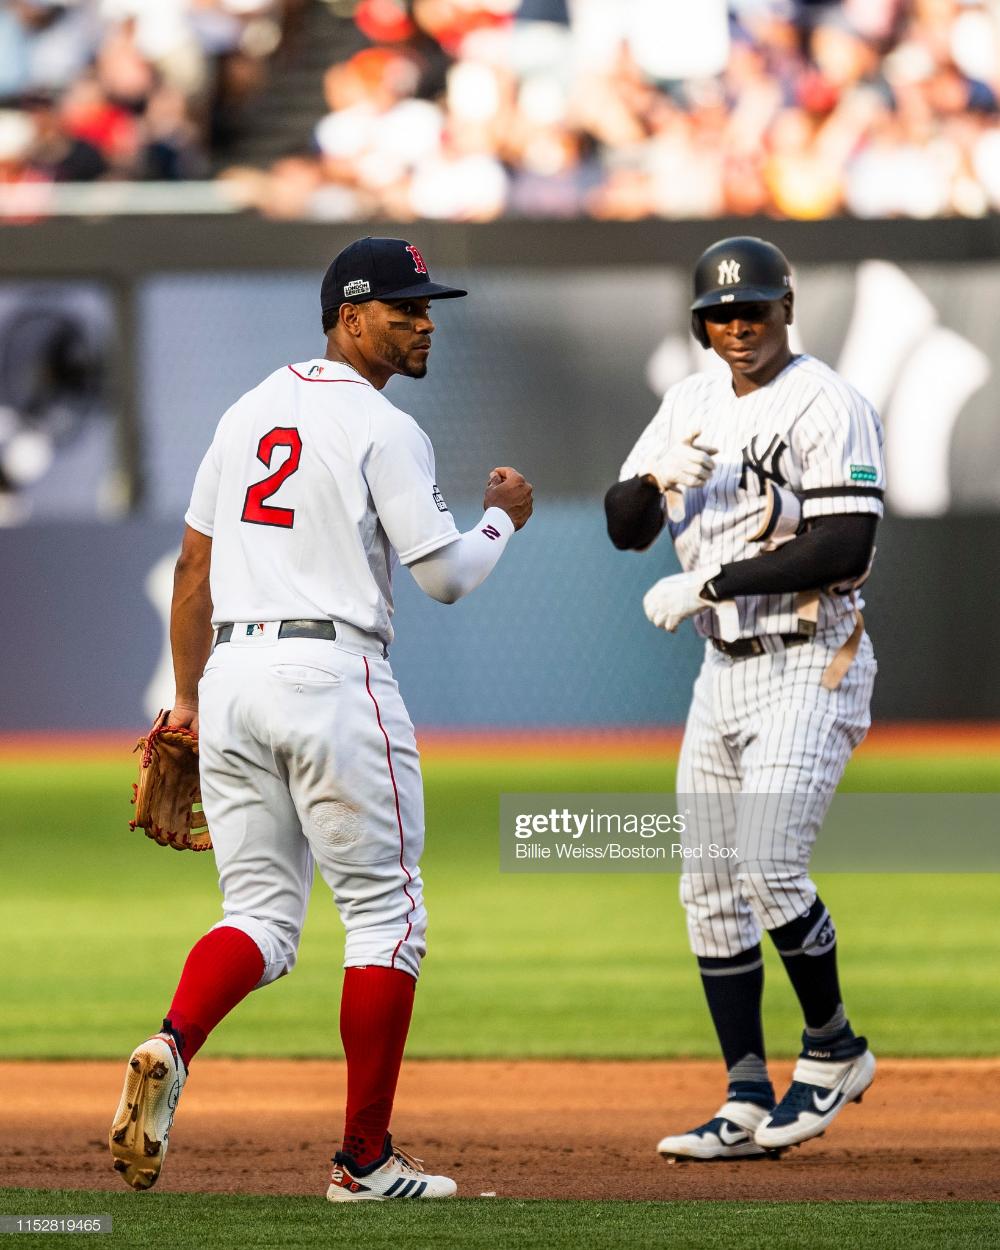 Didi Gregorius Of The New York Yankees Reacts After Hitting A Double New York Yankees Didi Gregorius Yankees Merchandise